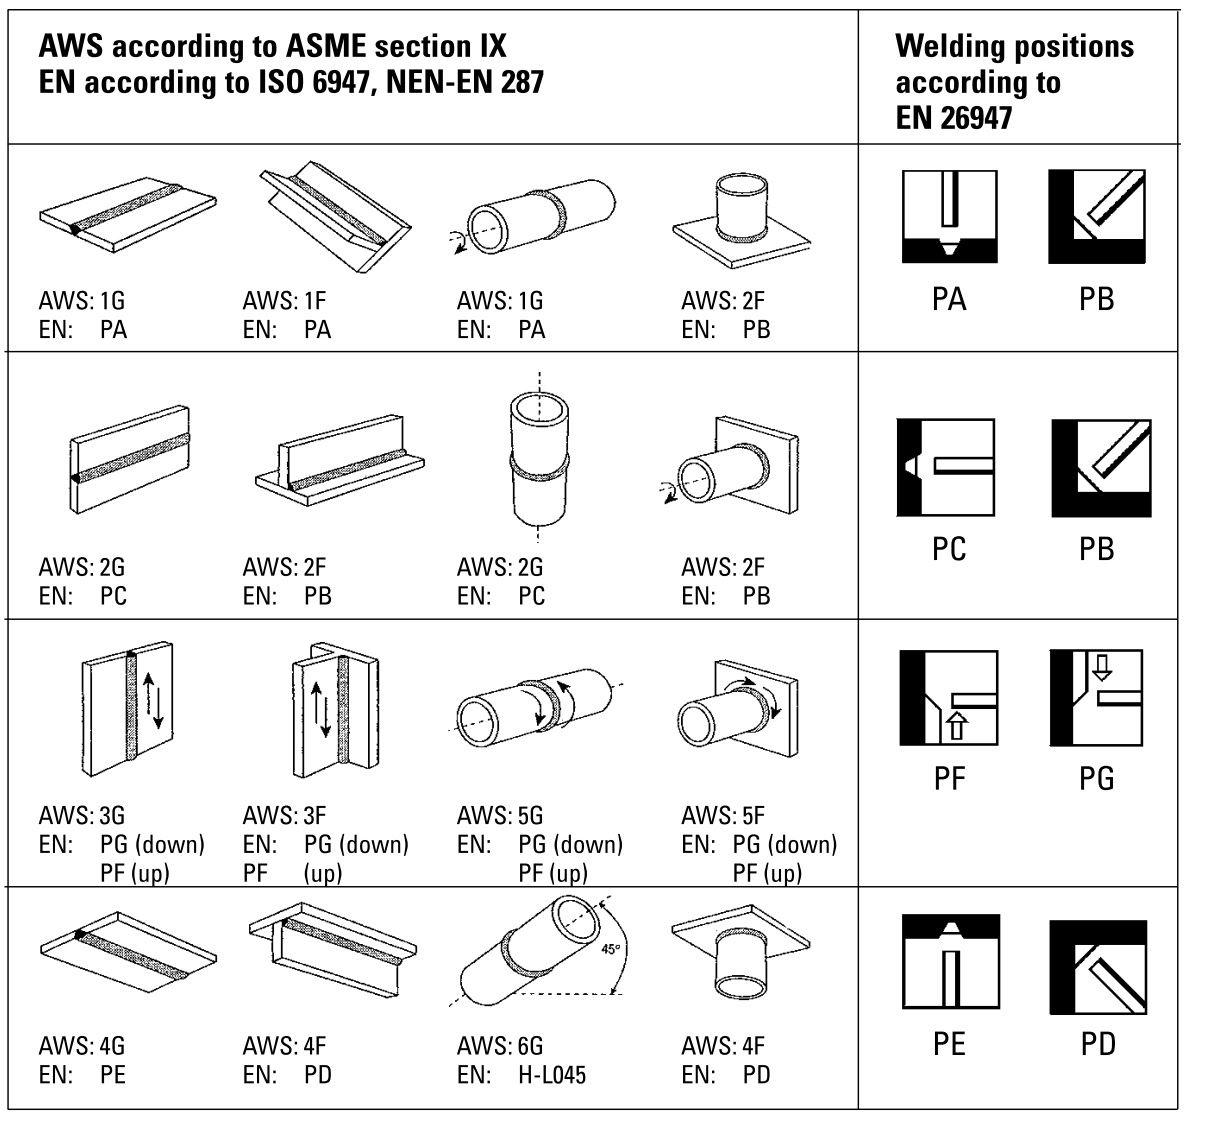 hight resolution of hasil gambar untuk 6g welding position model pinterest welding 2g pipe welding 6g welding position diagram